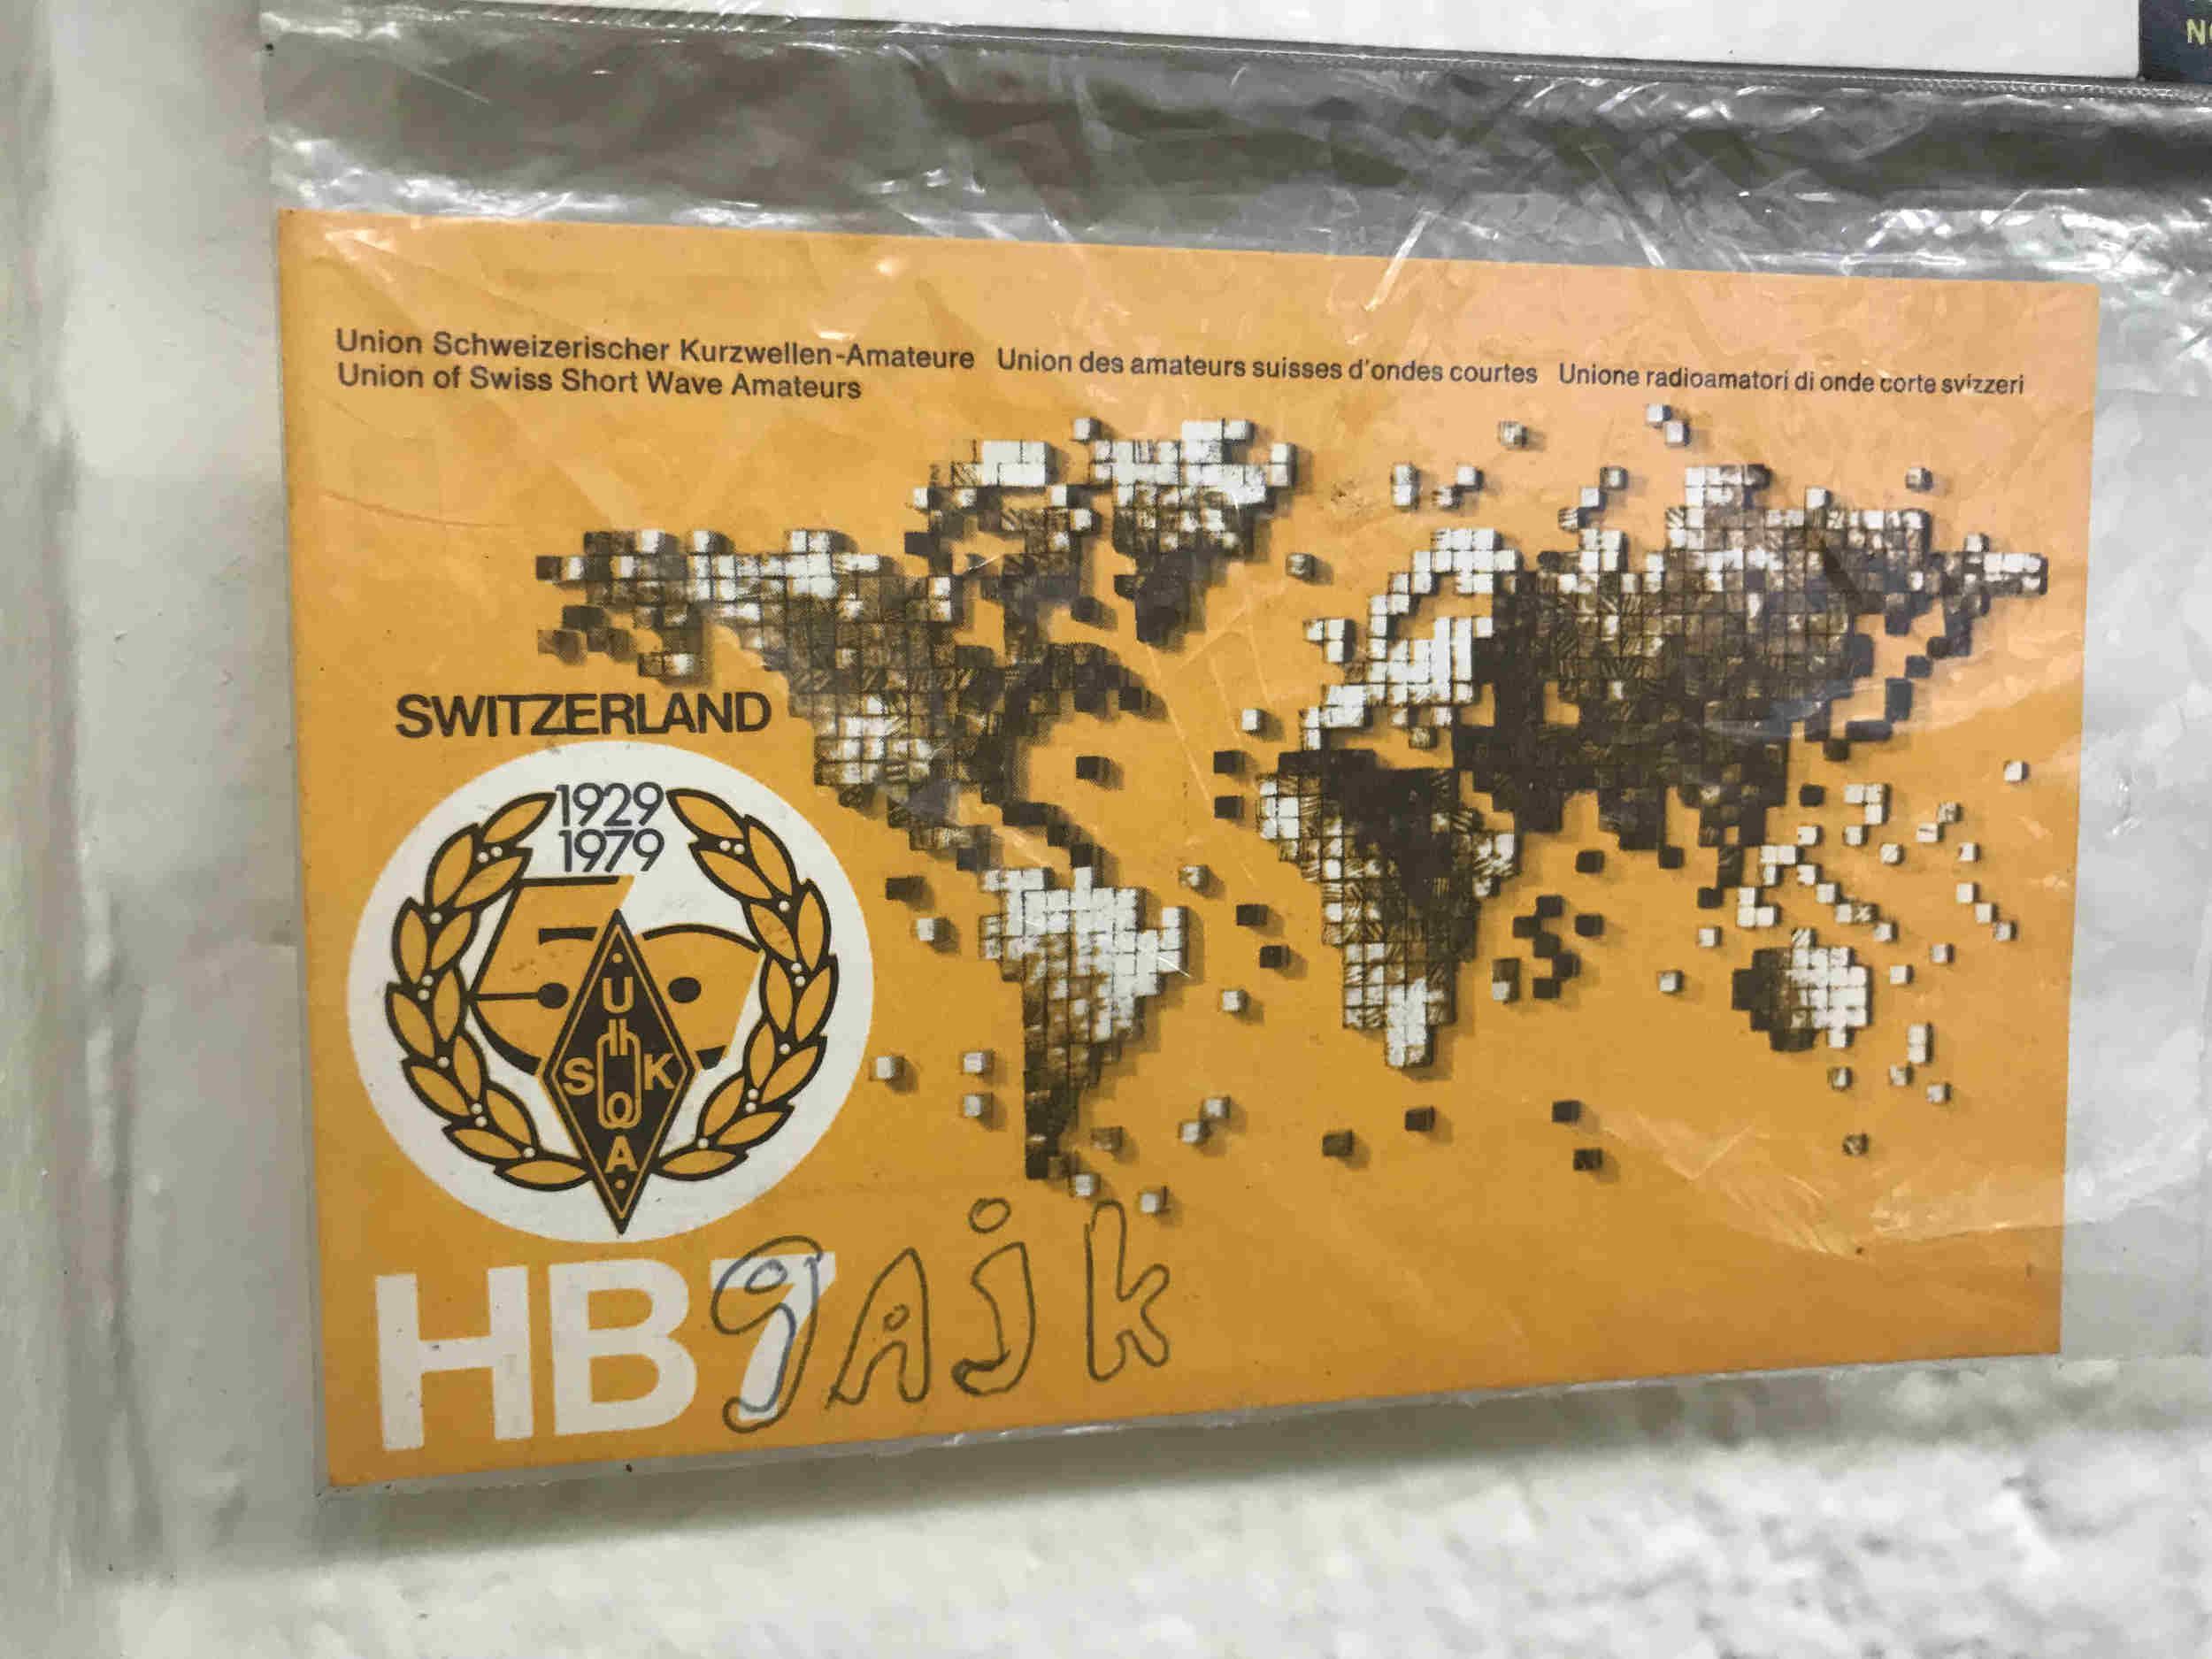 HB9AJK QSL Card